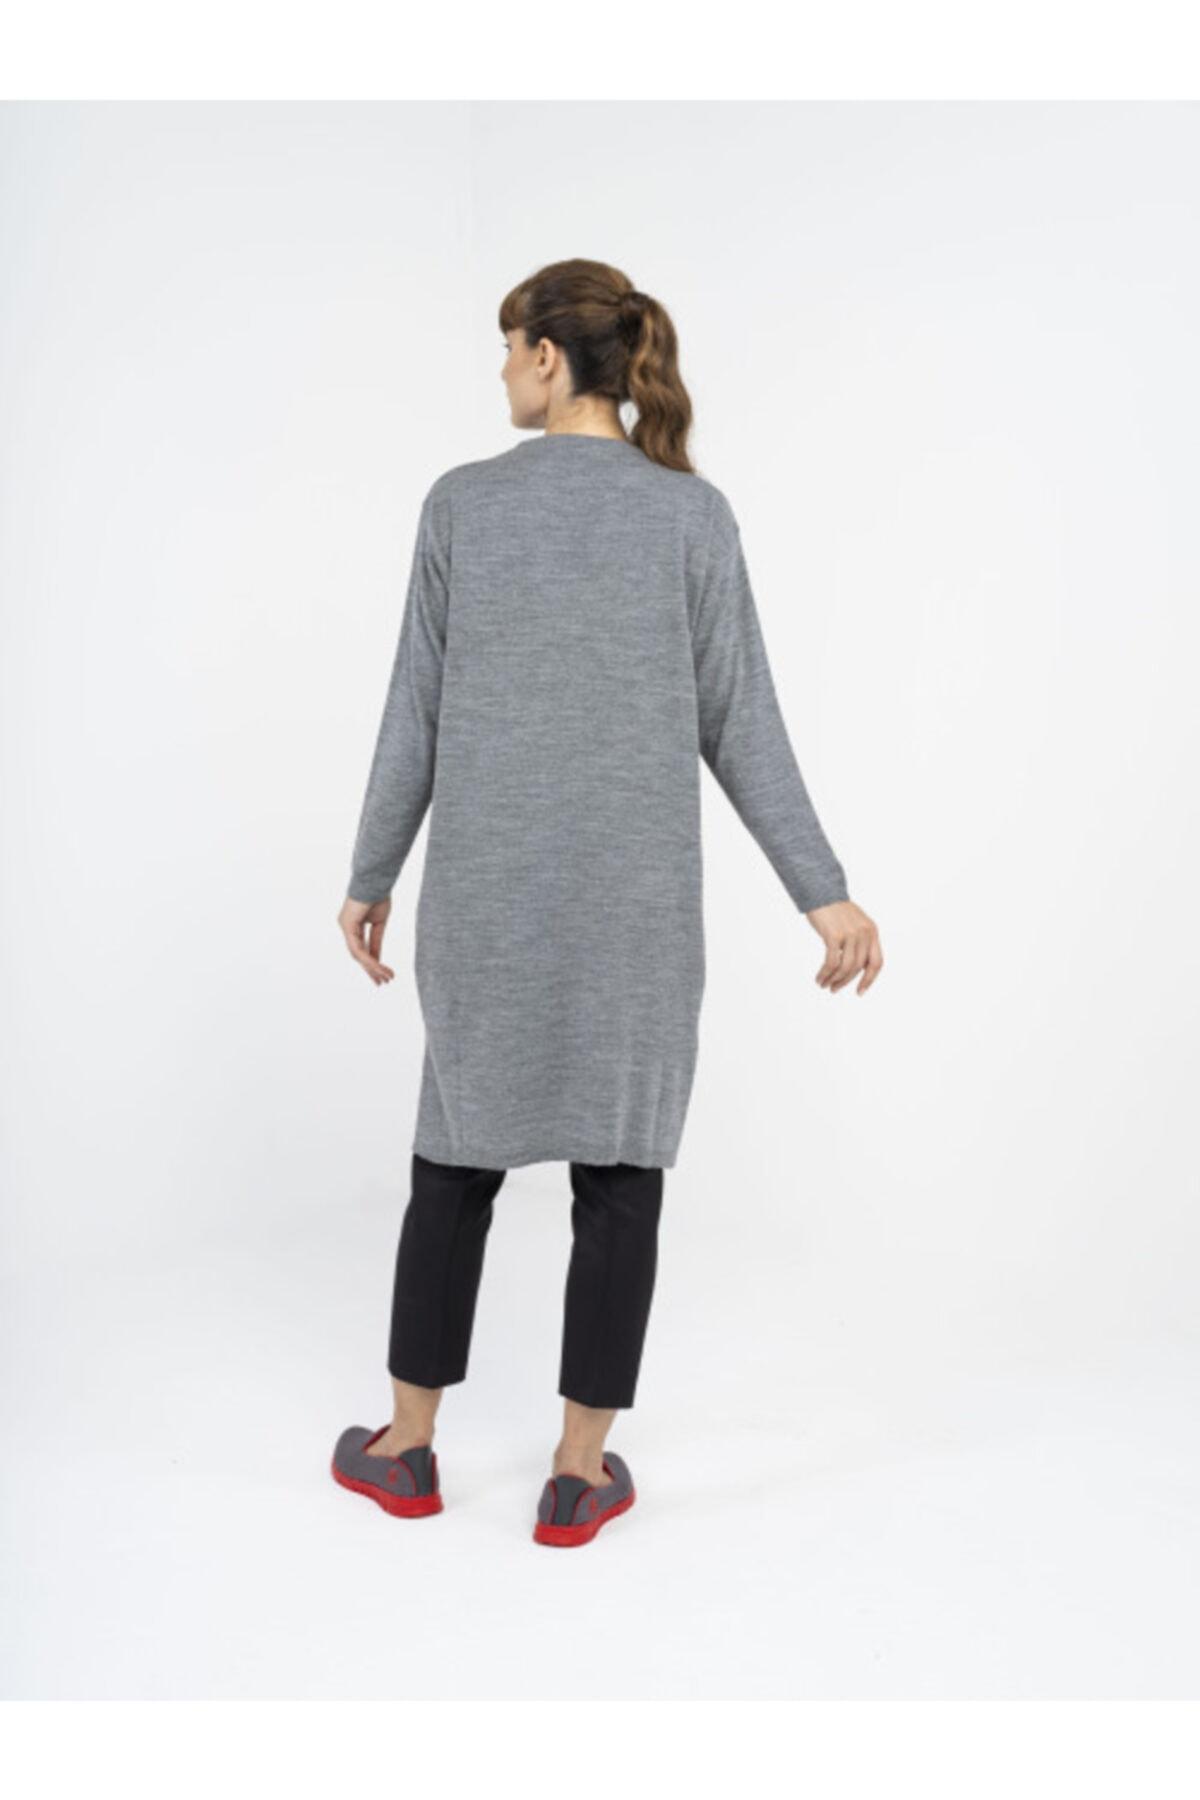 R4 Kadın Gri Horoz Motifli Triko Tunik 2